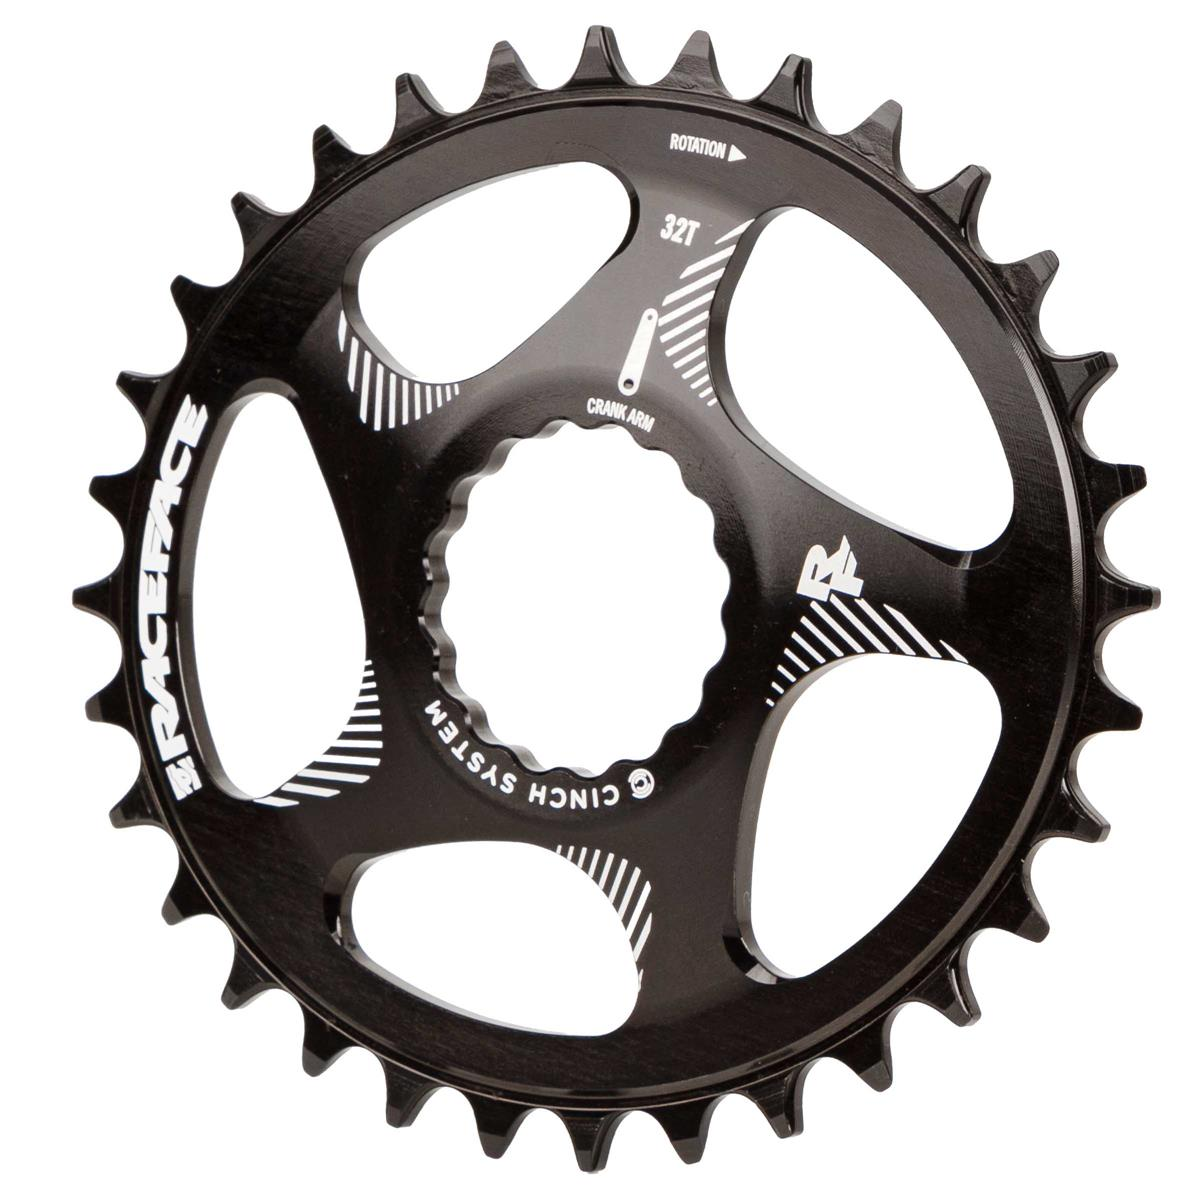 Race Face MTB-Kettenblatt Oval Schwarz, Direct Mount, Cinch, für 10/11/12-Fach